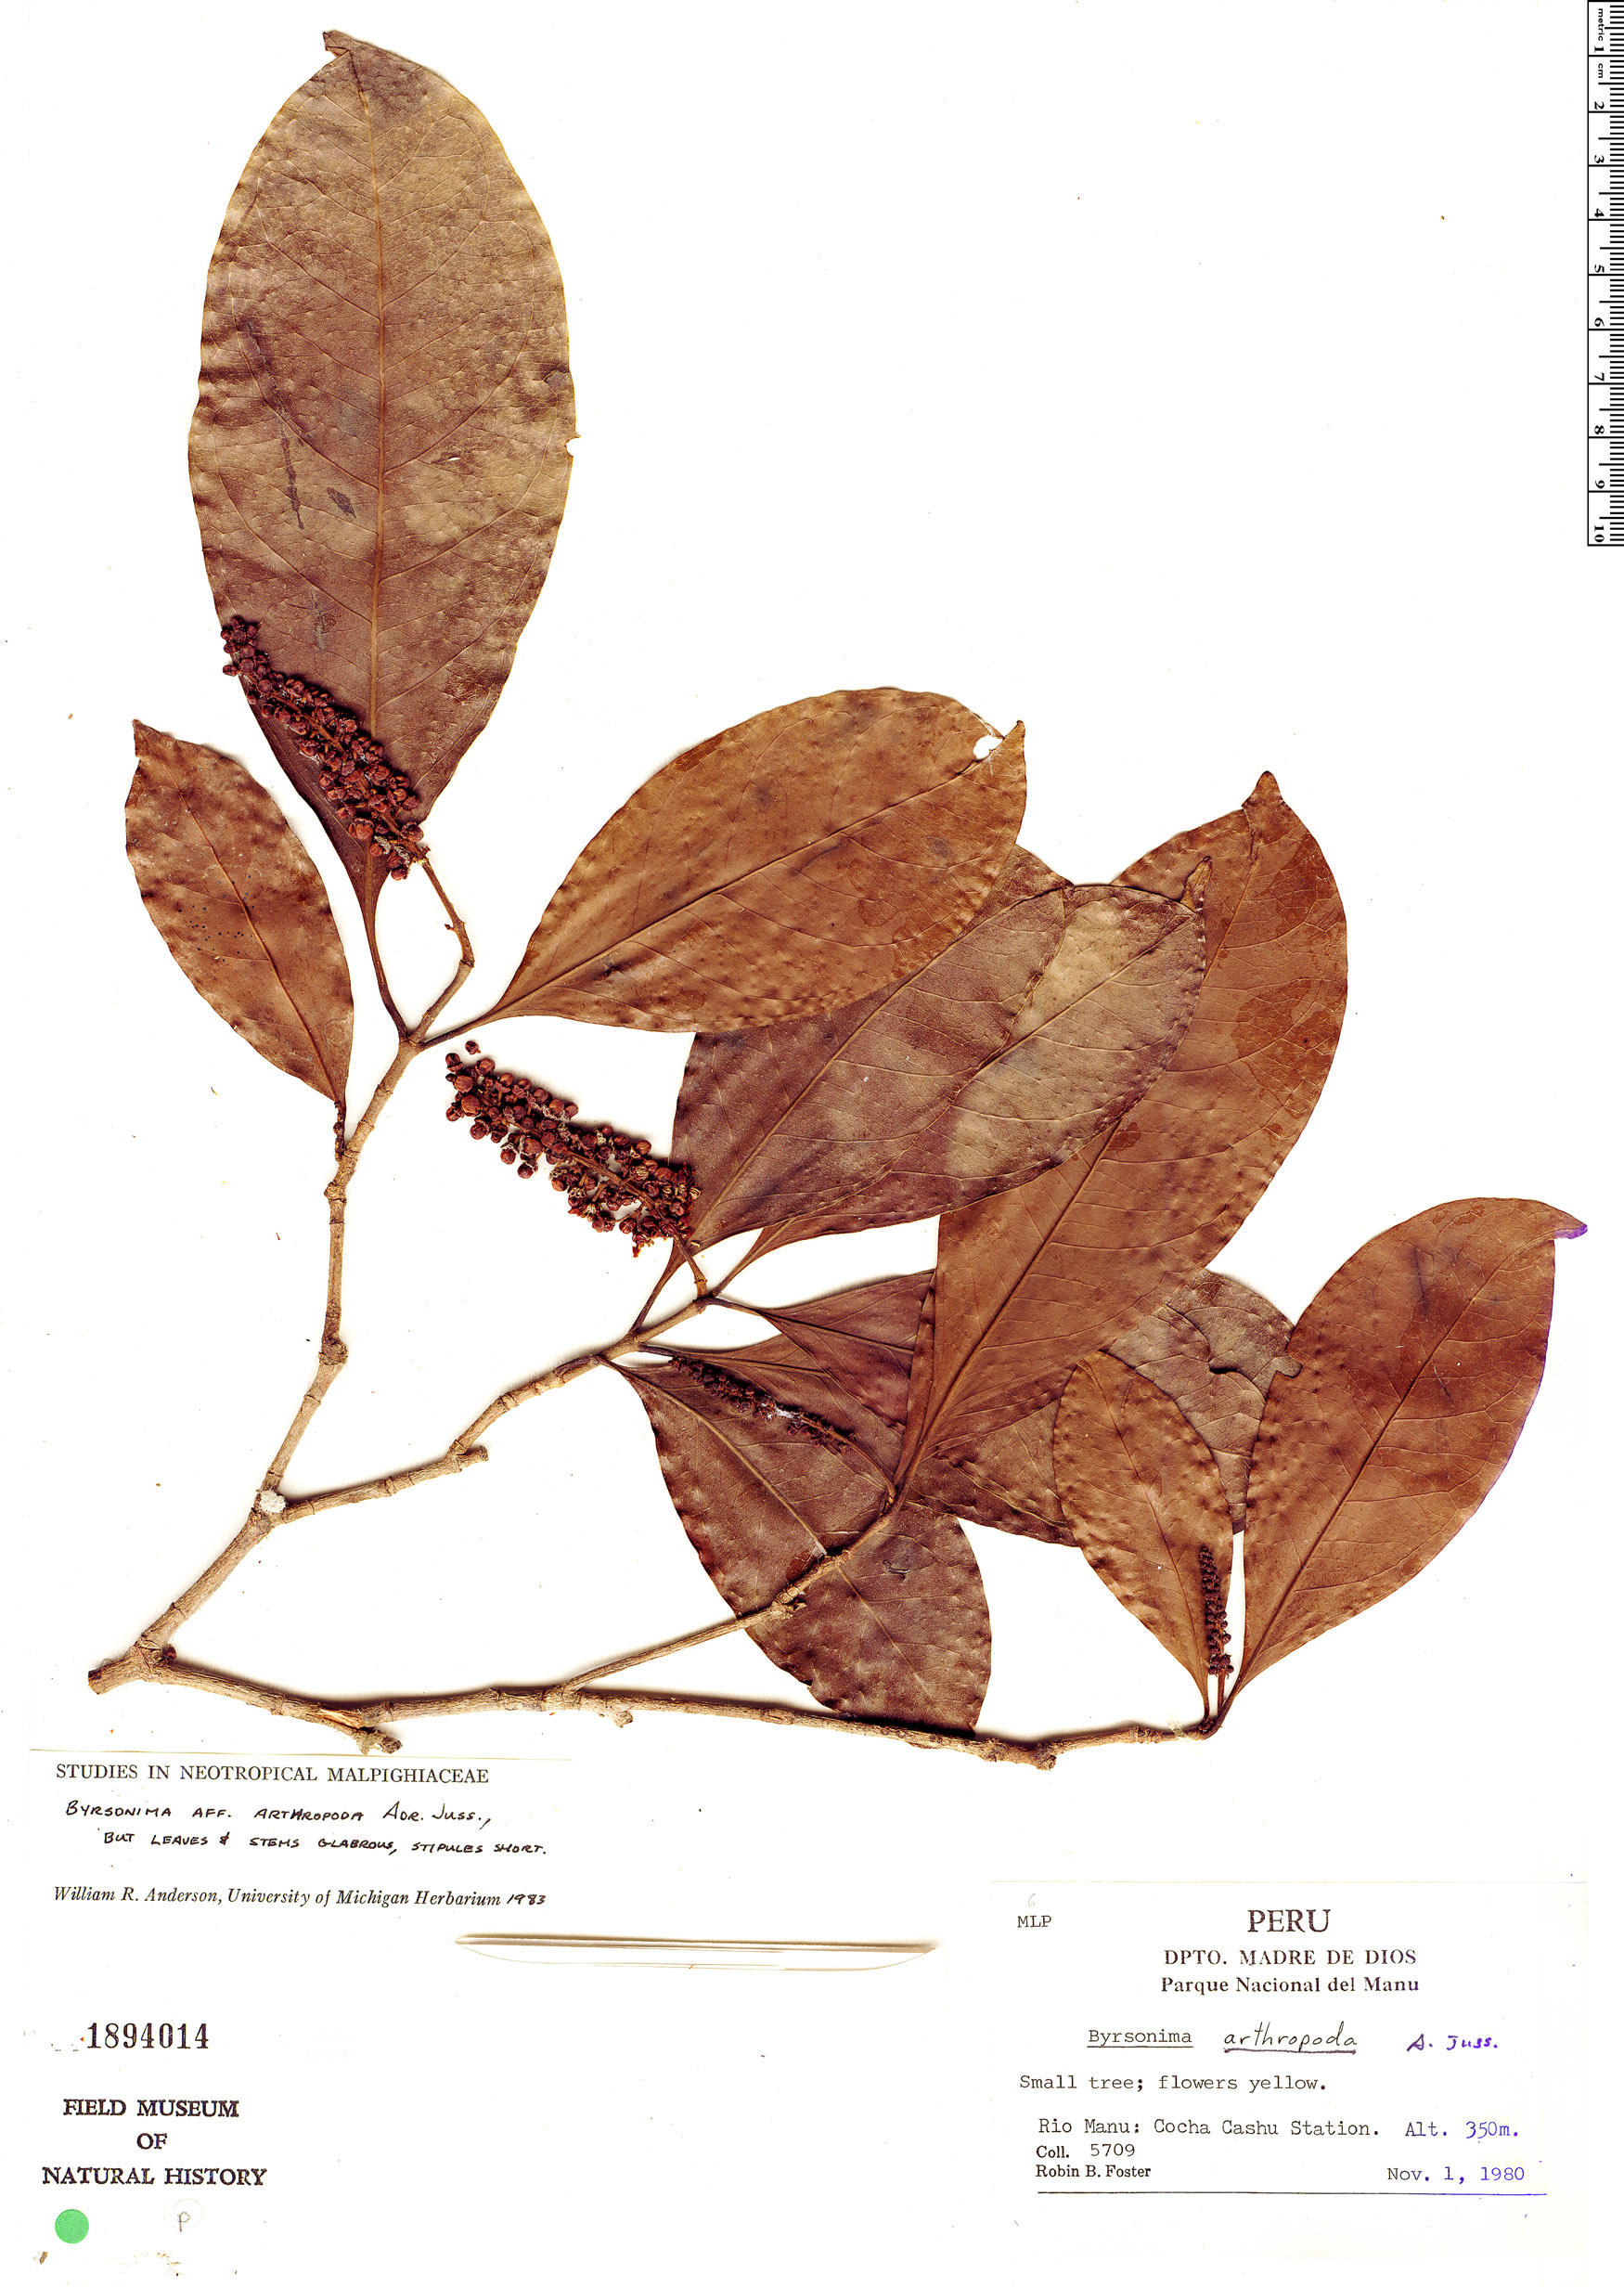 Espécime: Byrsonima arthropoda